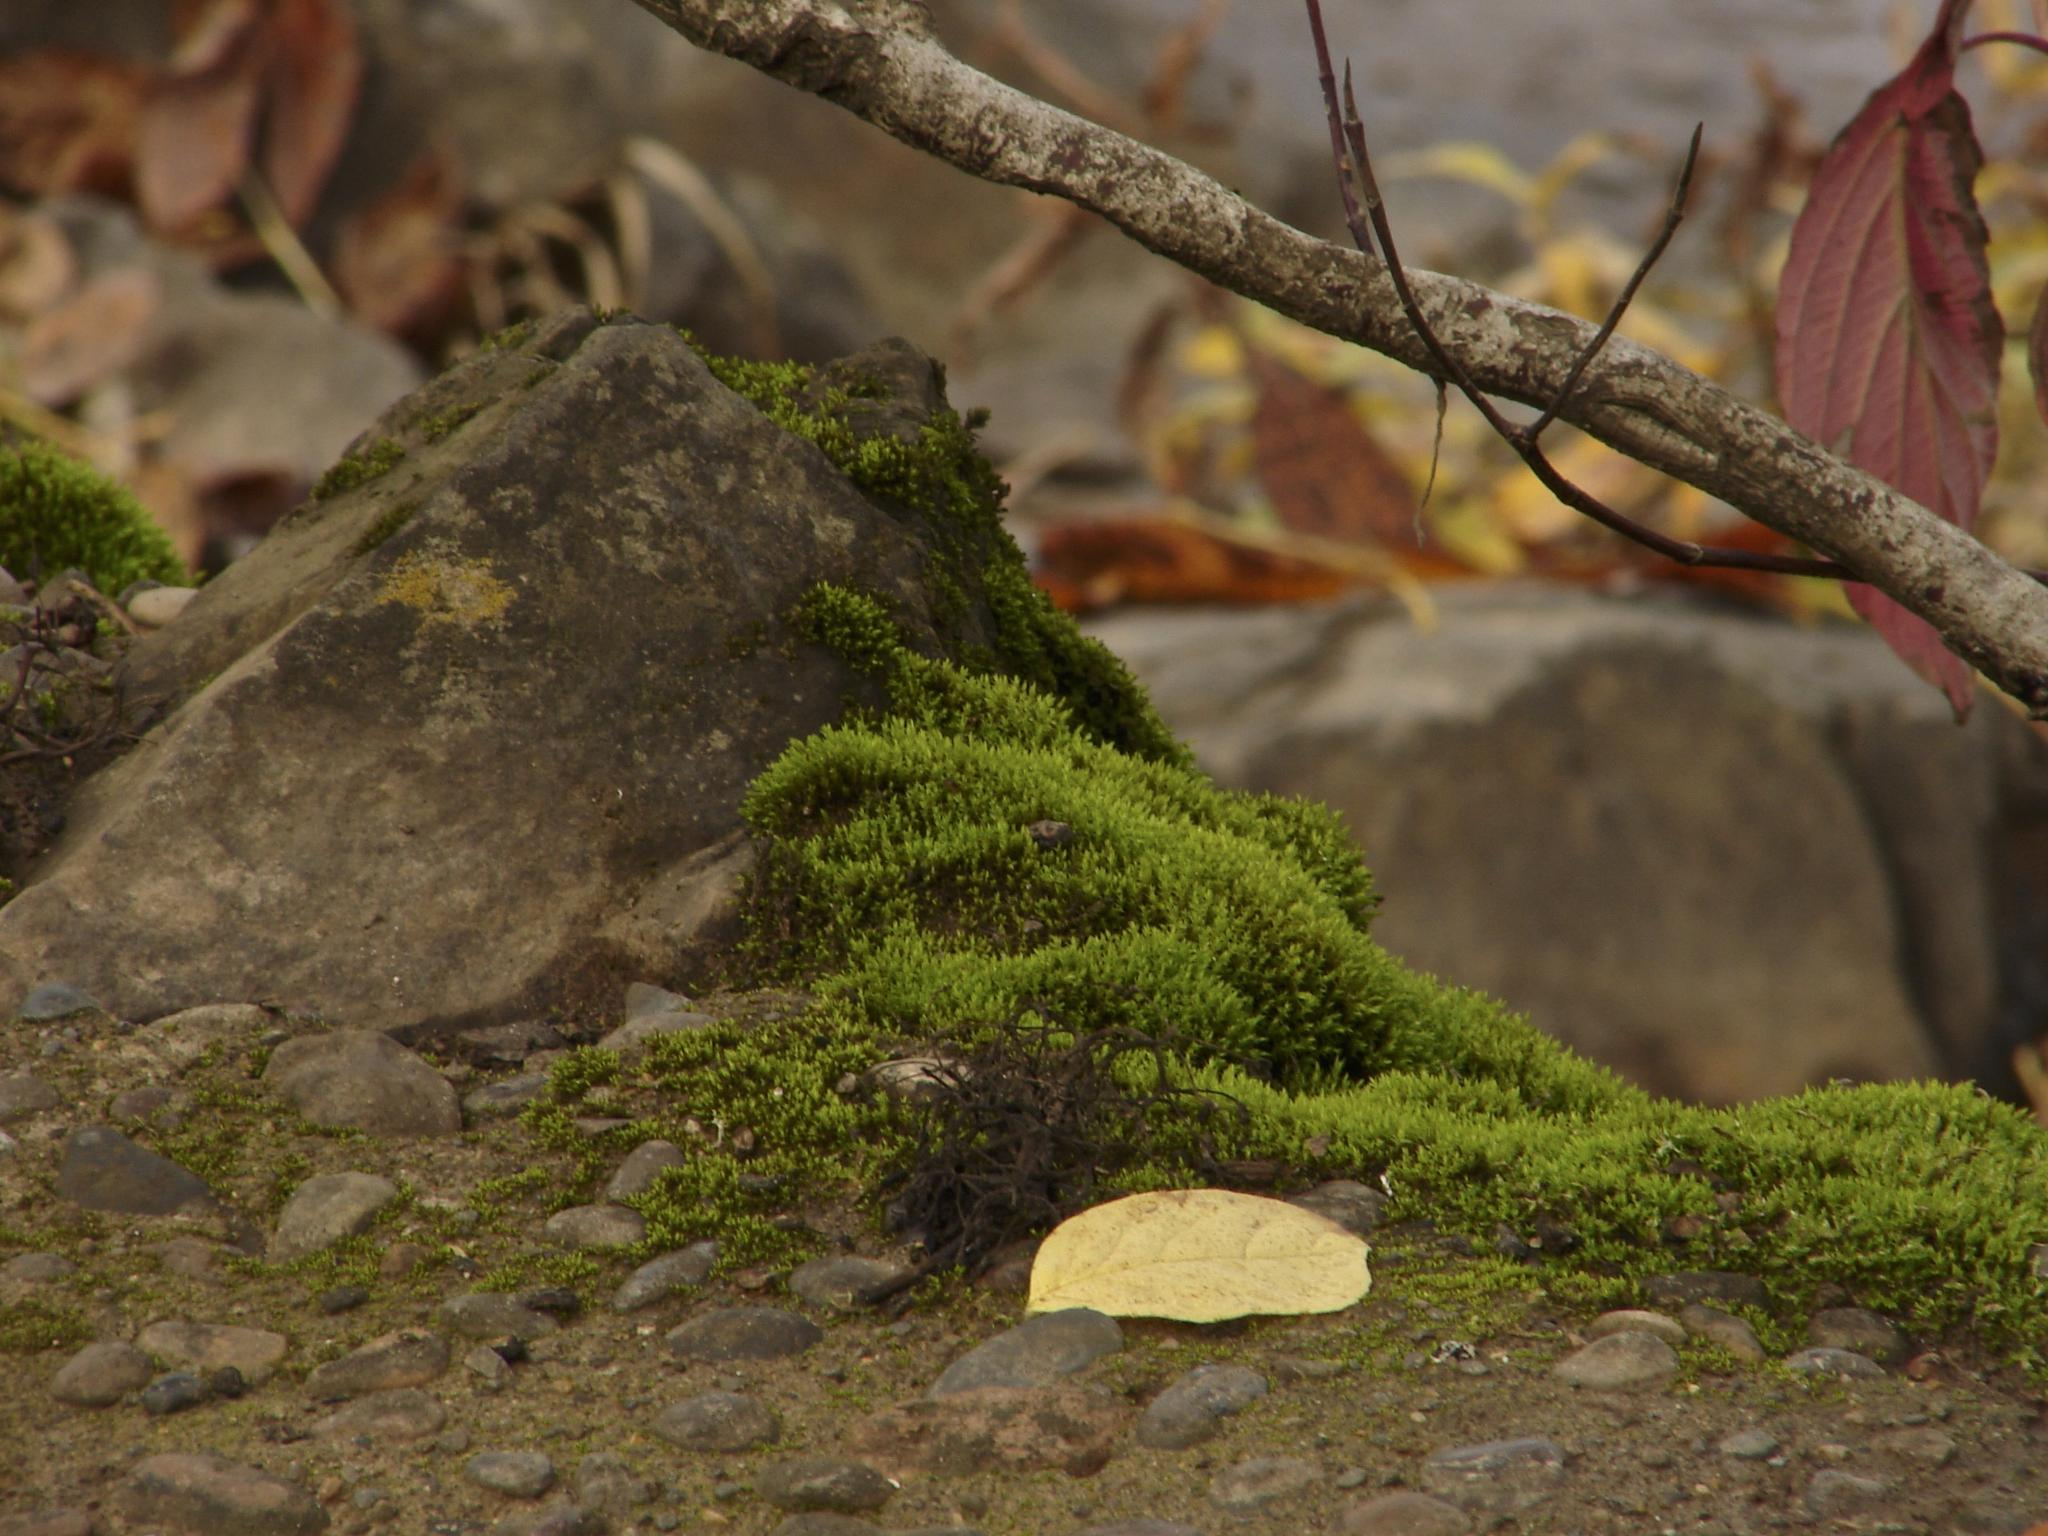 Miniature Shire by MelanieAnnePhillips